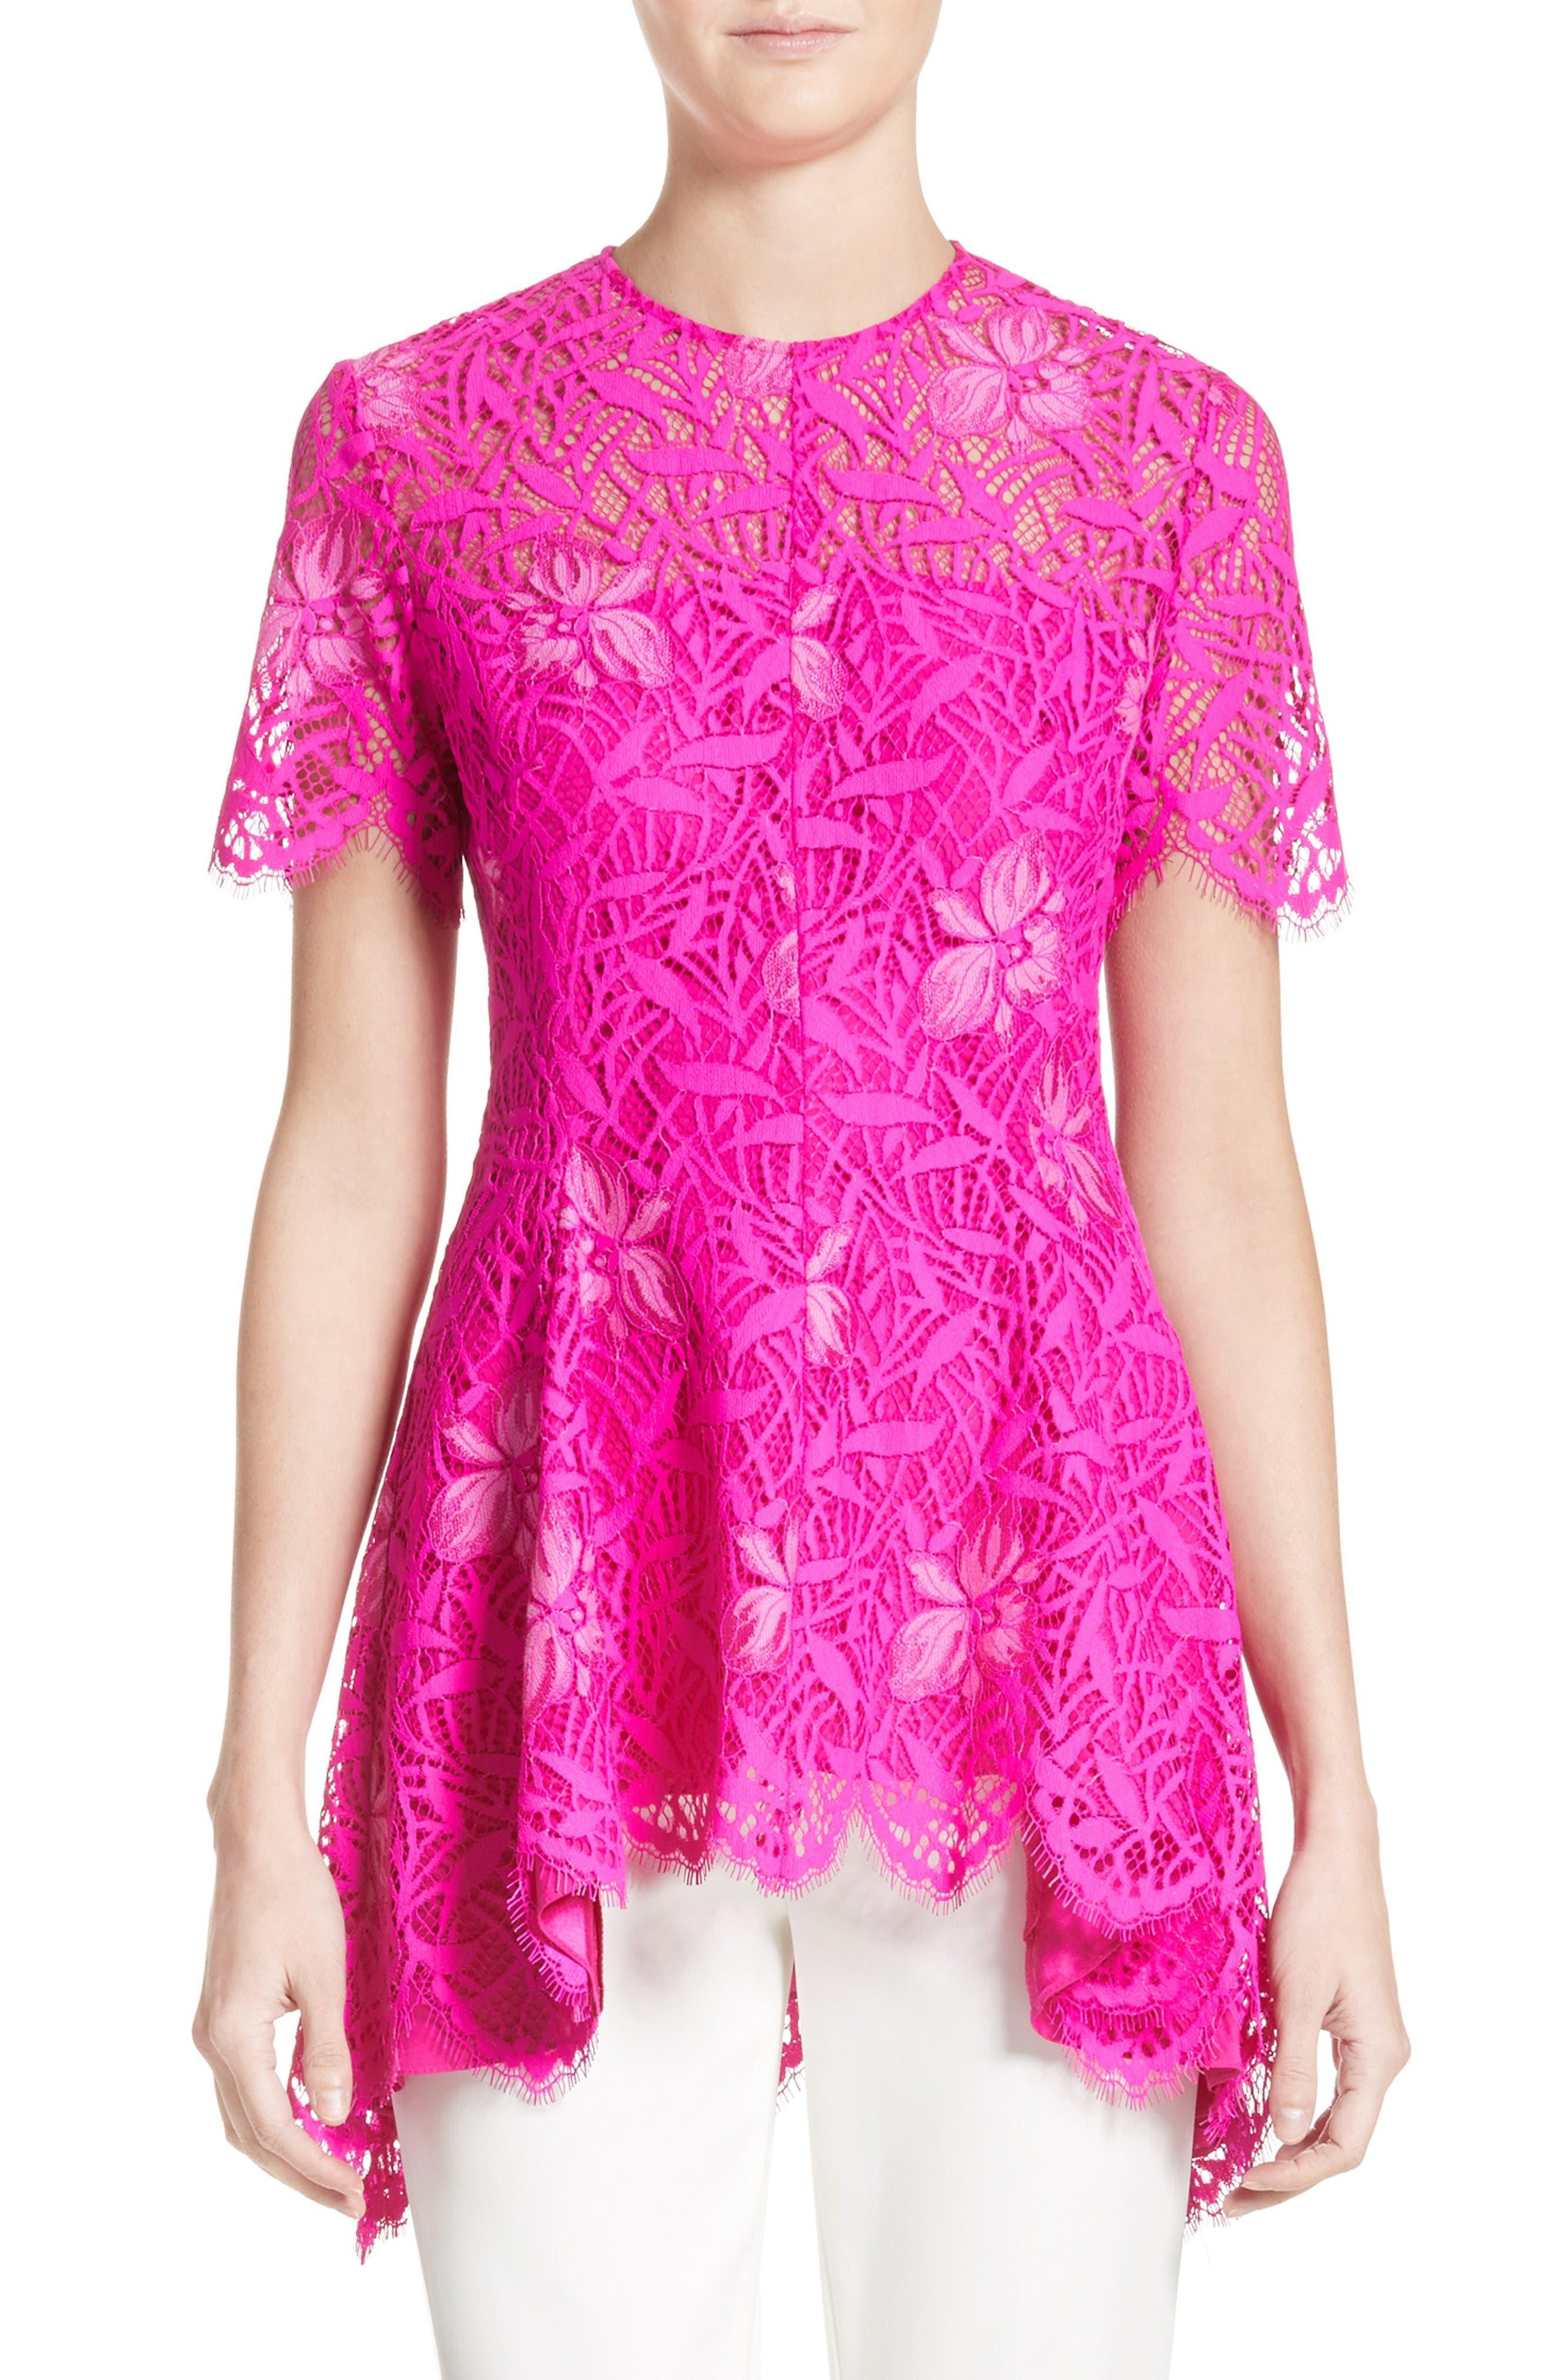 Main Image - Lela Rose Floral Lace Peplum Top